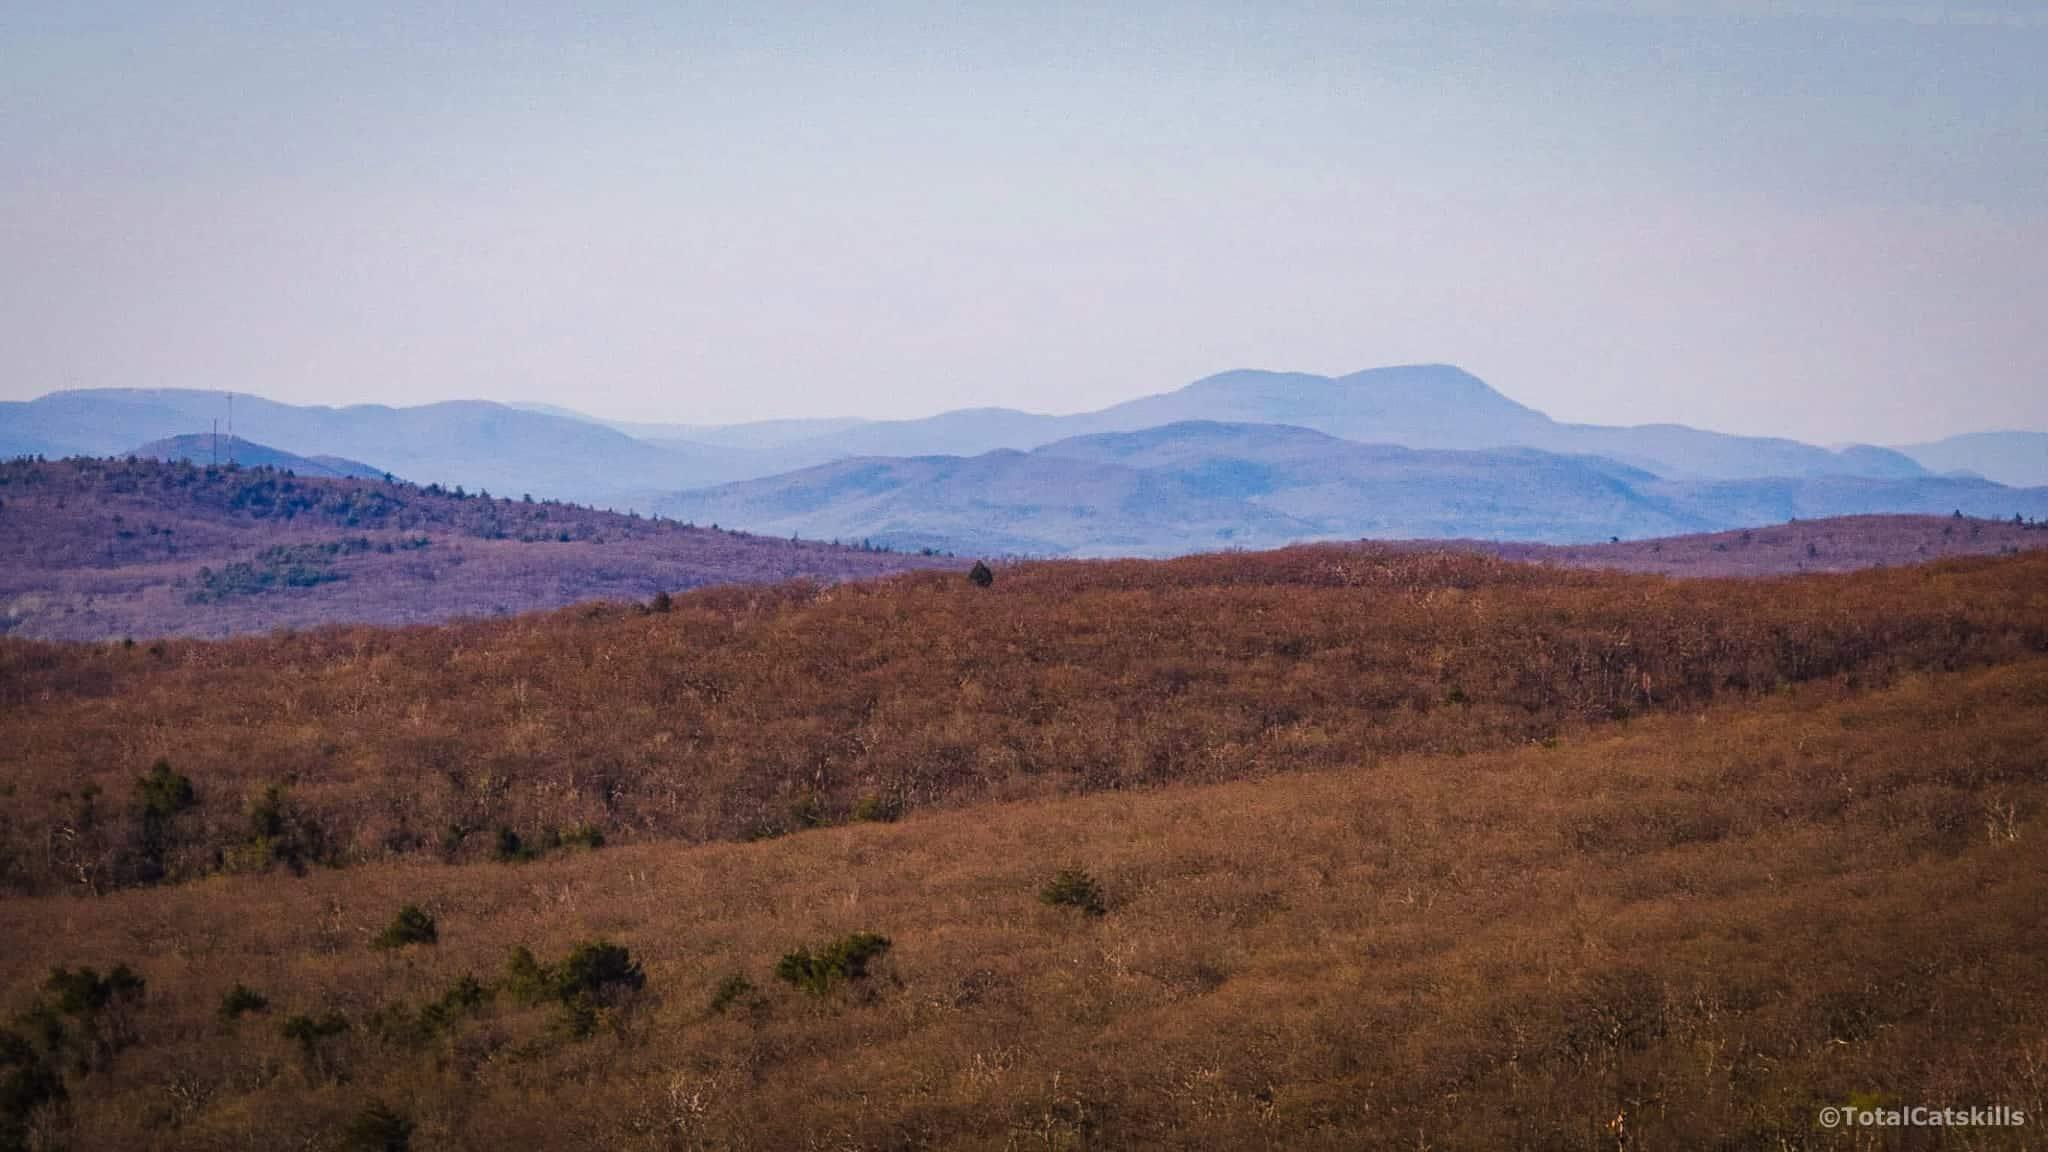 mountain range in distance